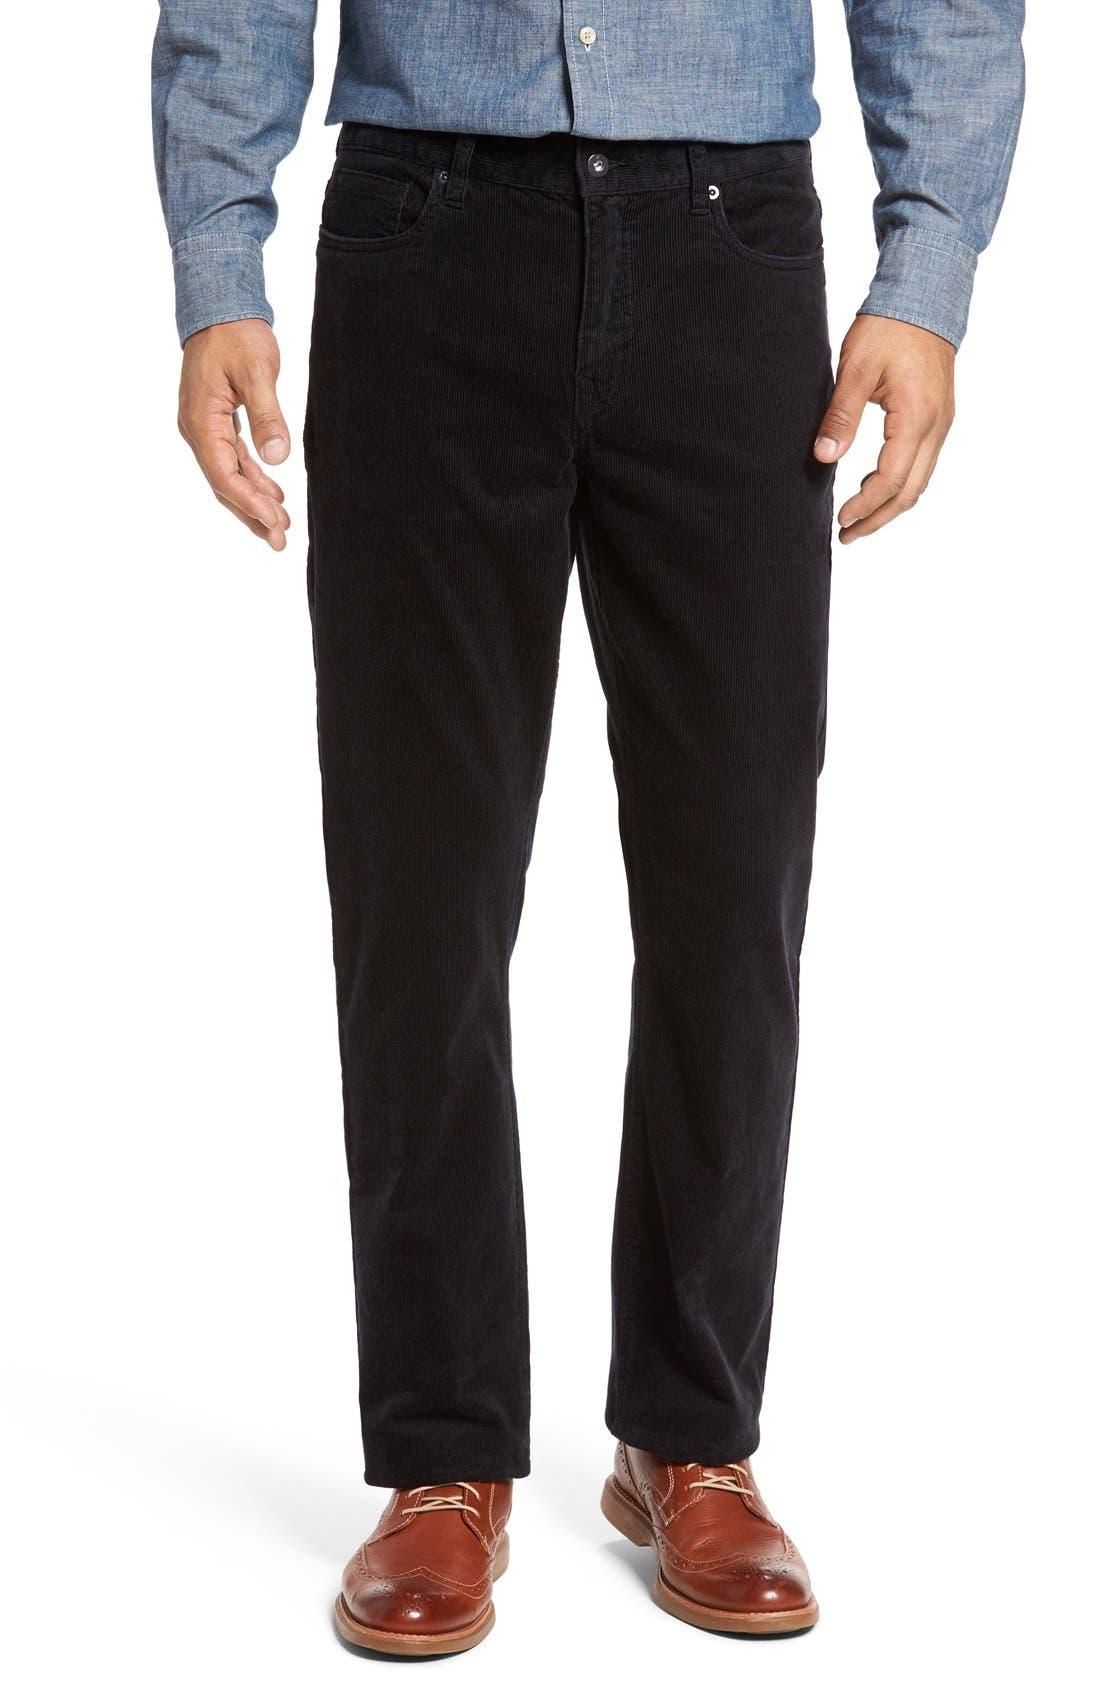 Greenwood Stretch Corduroy Pants,                             Main thumbnail 1, color,                             001